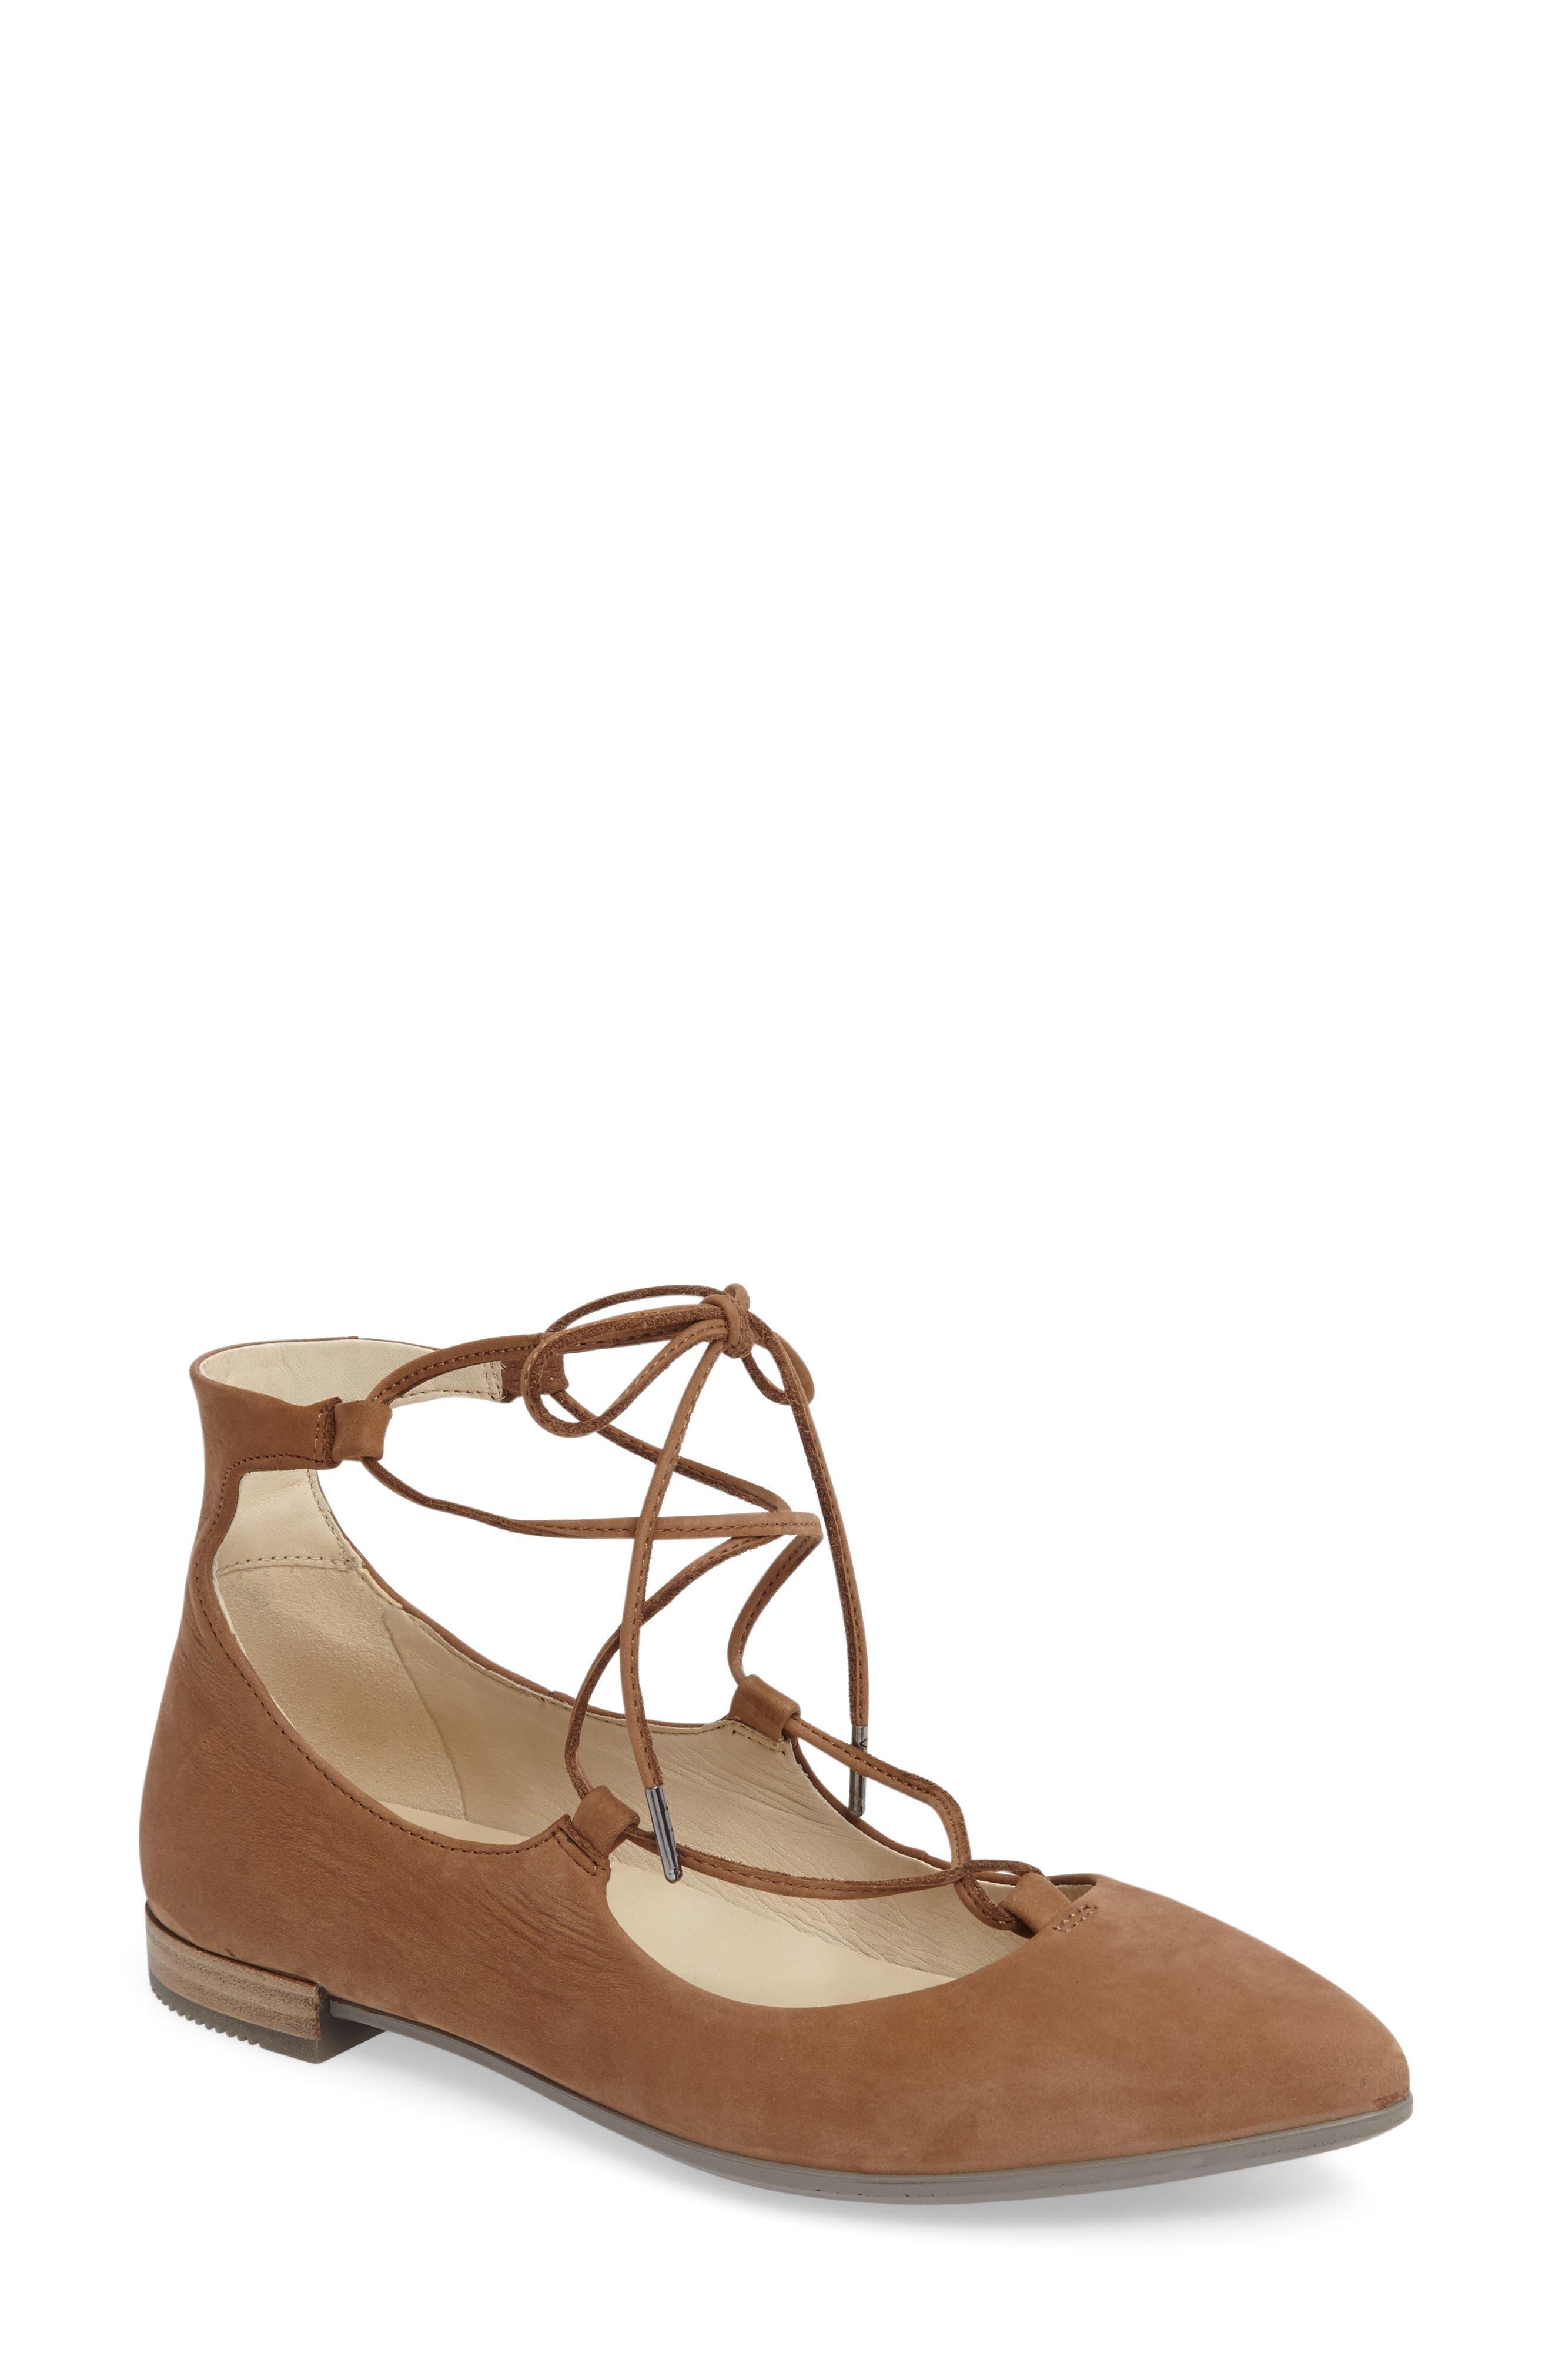 Alternate Image 1 Selected - ECCO Shape Ankle Wrap Ballet Flat (Women)